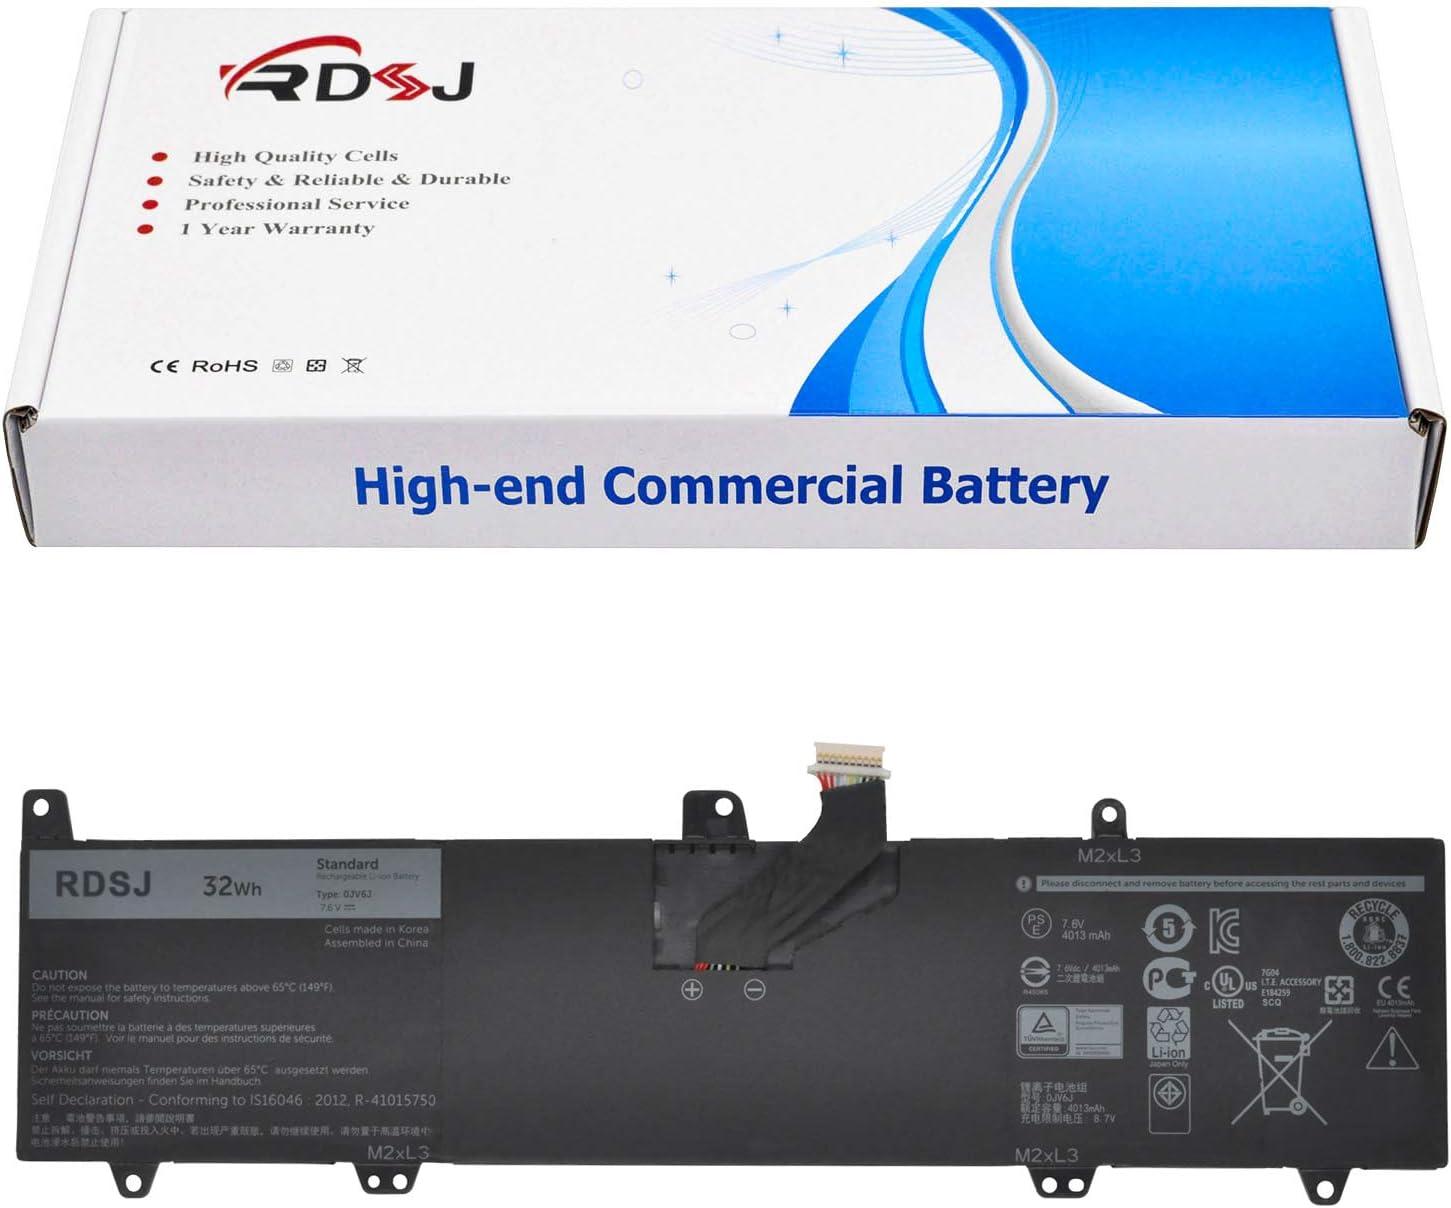 0JV6J Laptop Battery for Dell Inspiron 11 3162 3164 3168 3169 3179 3180 3185 Series OJV6J 8NWF3 08NWF3 PGYK5 0PGYK5 7.6V 32Wh